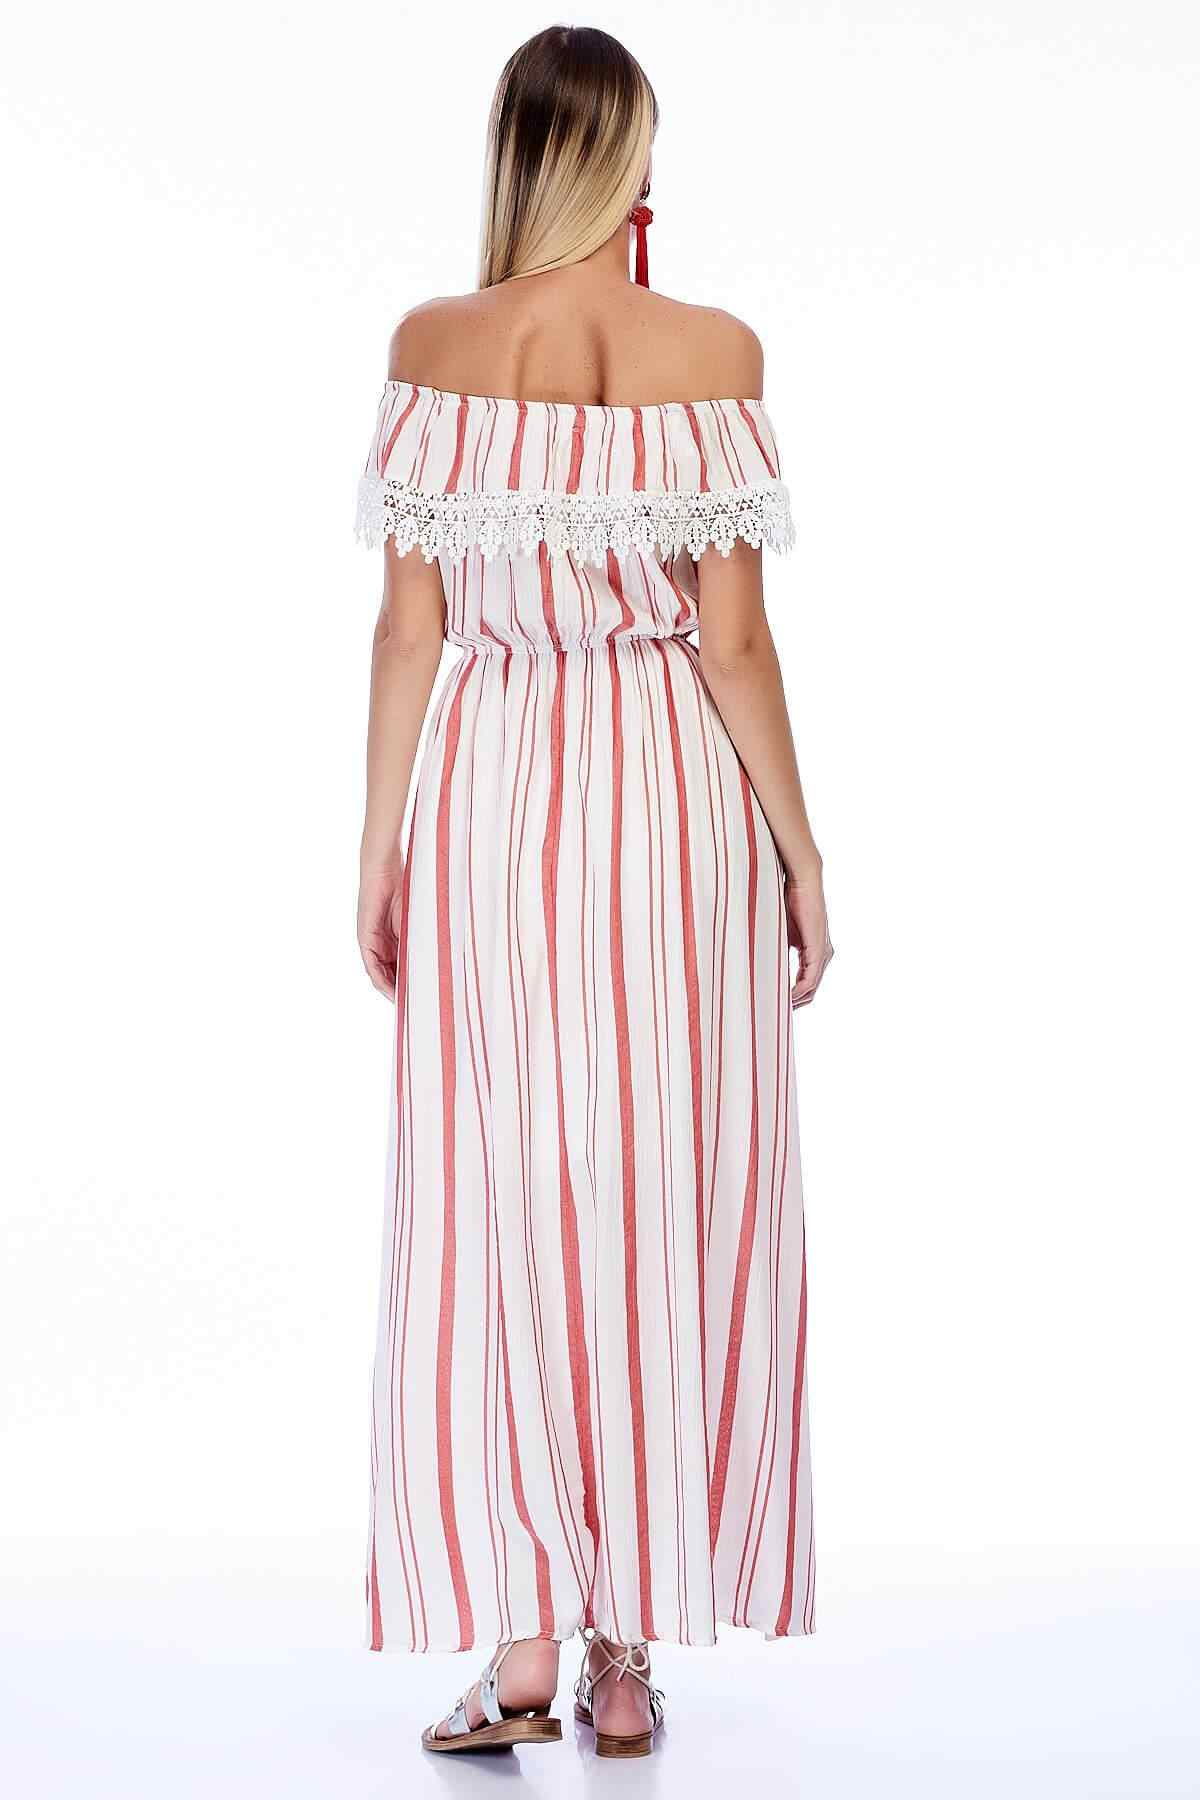 Coton humeur femmes ekru-kırmızoft tissu épais Çizgi Madonna cou lacé longue robe 82909831